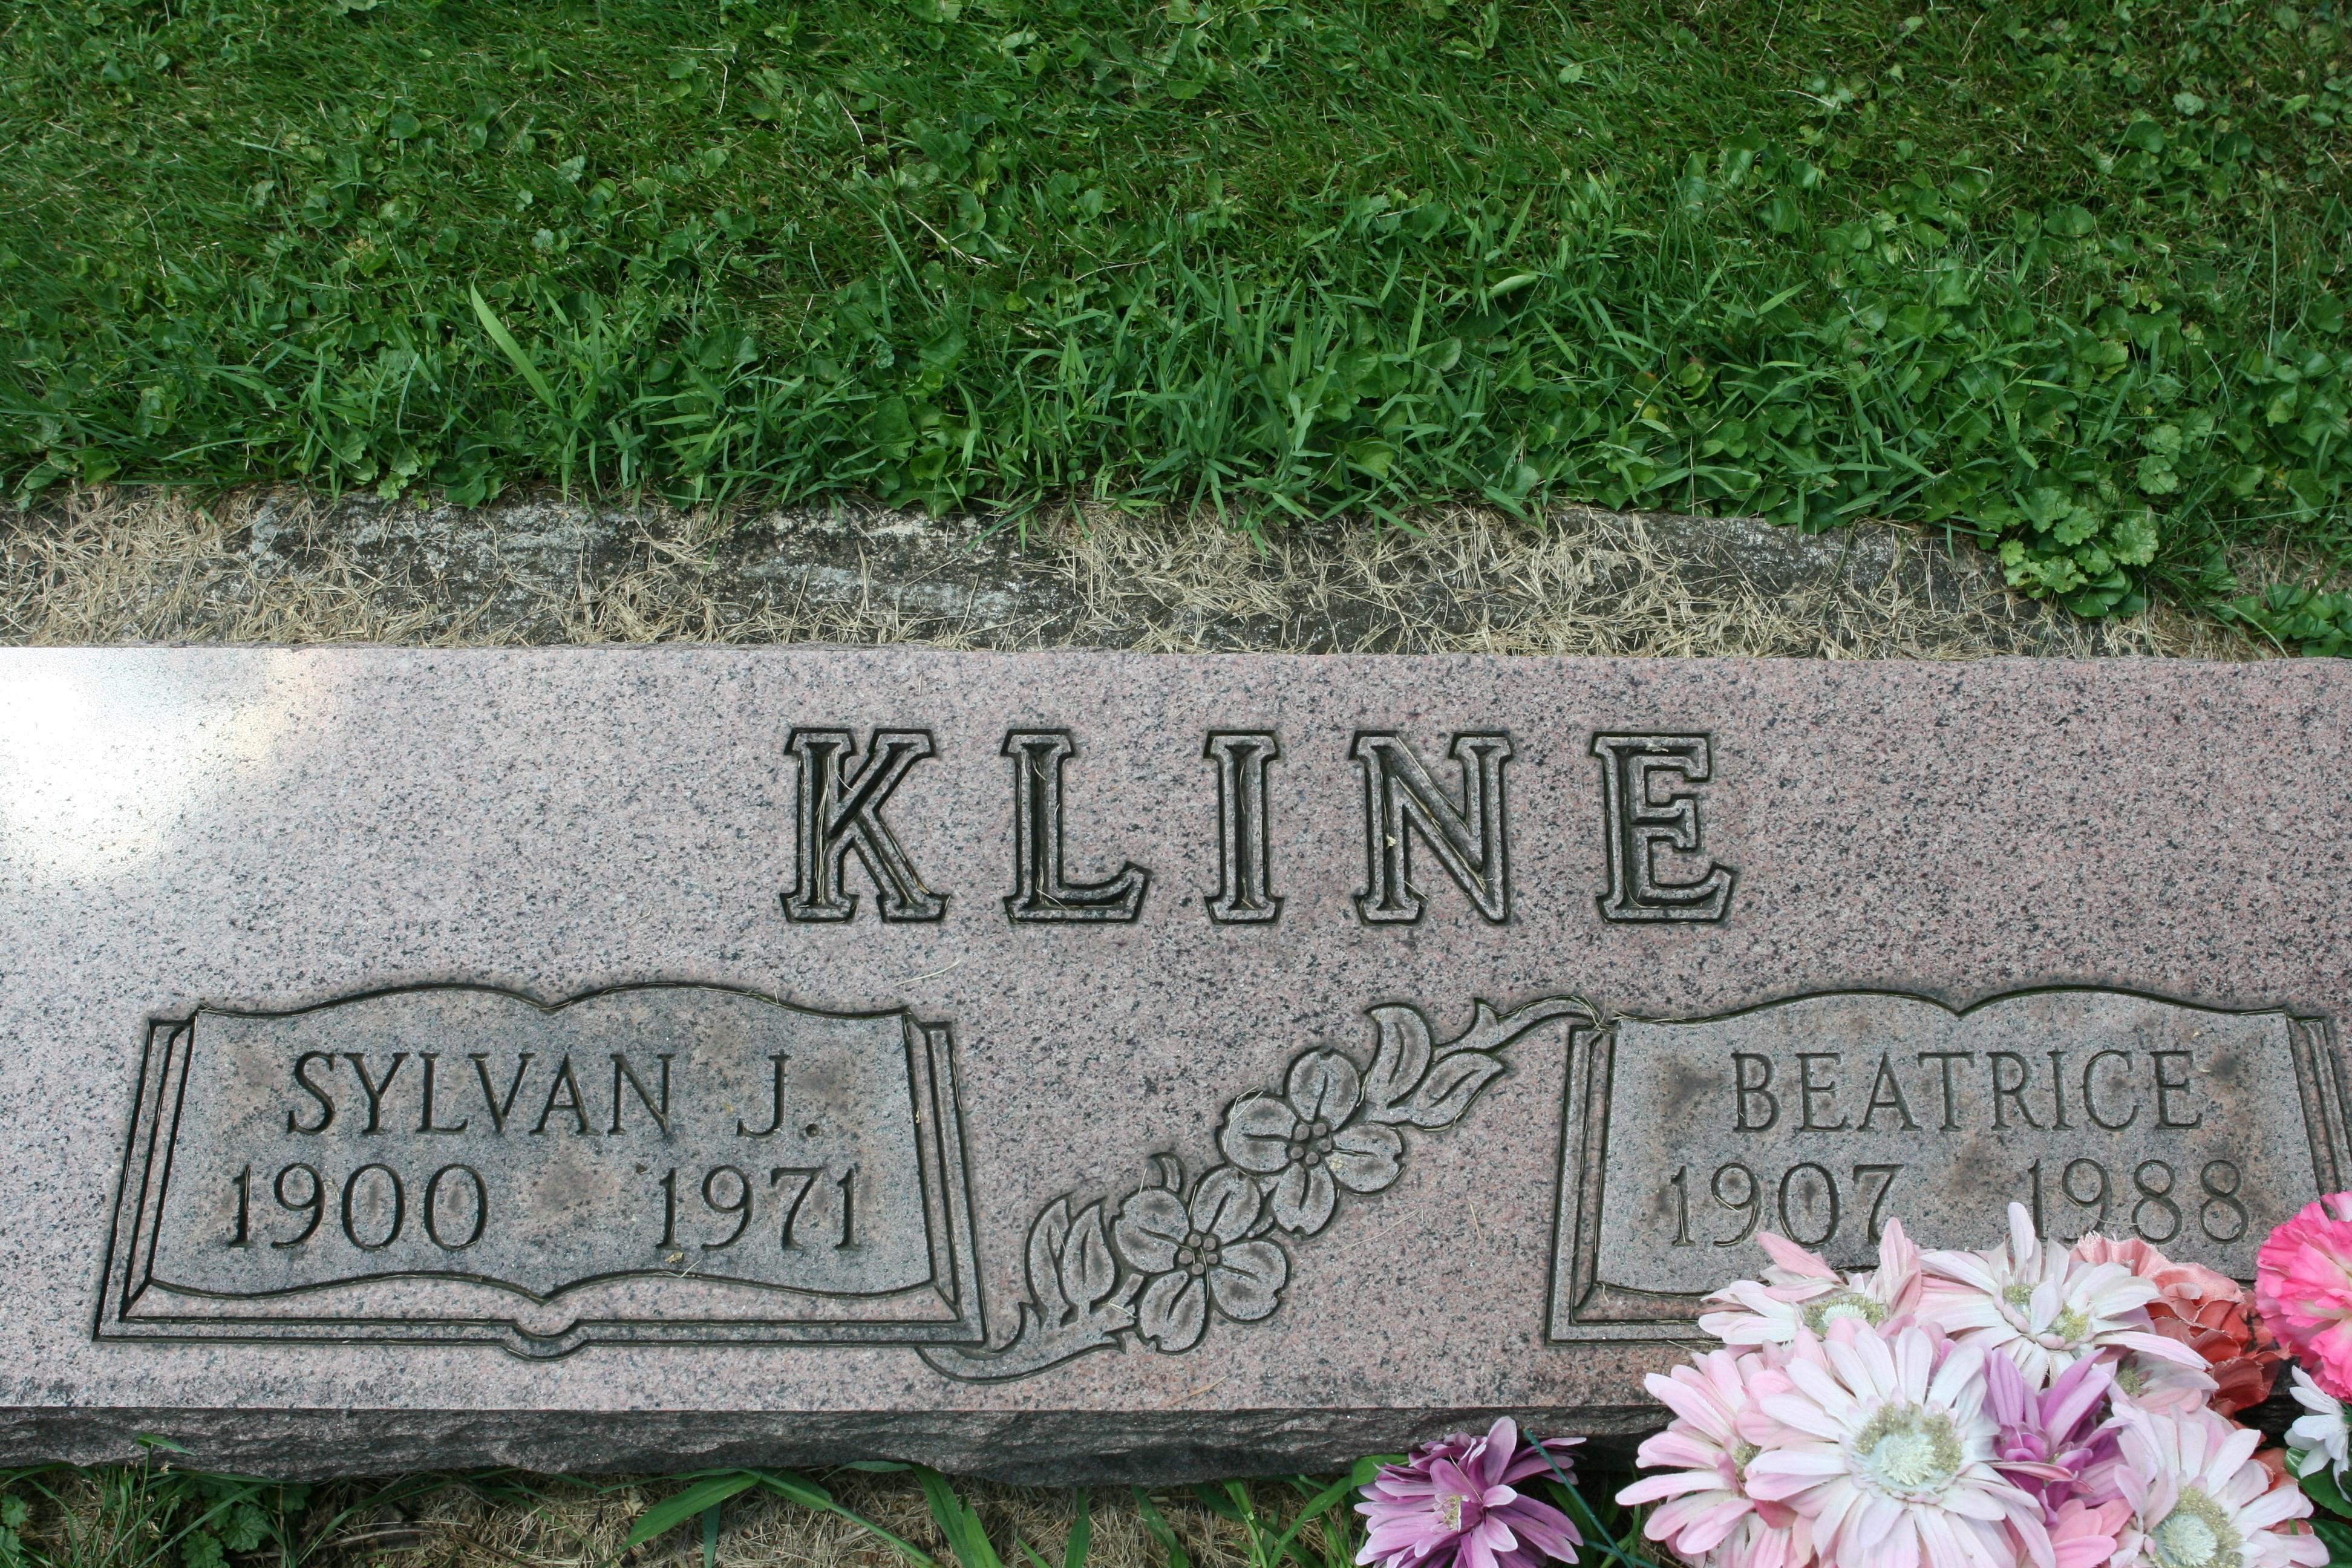 Lesley Joseph Kline